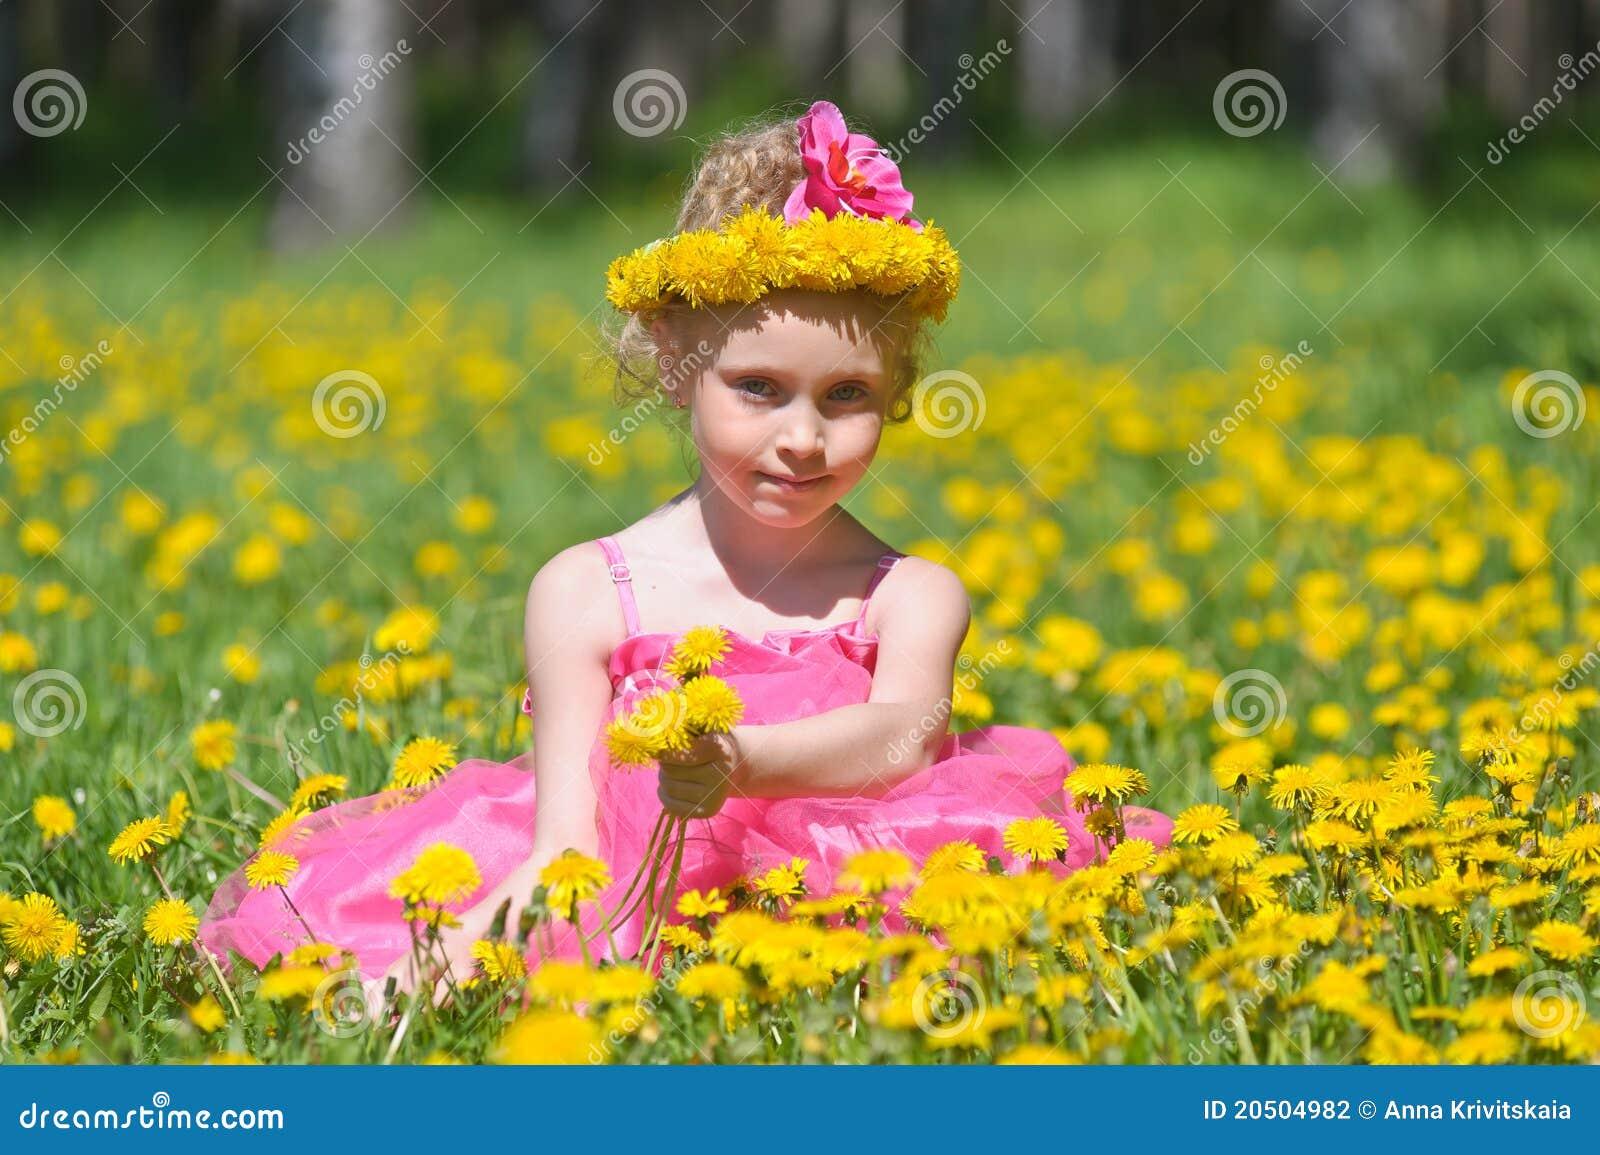 Dandelion Flower Crown Choice Image Flower Wallpaper Hd